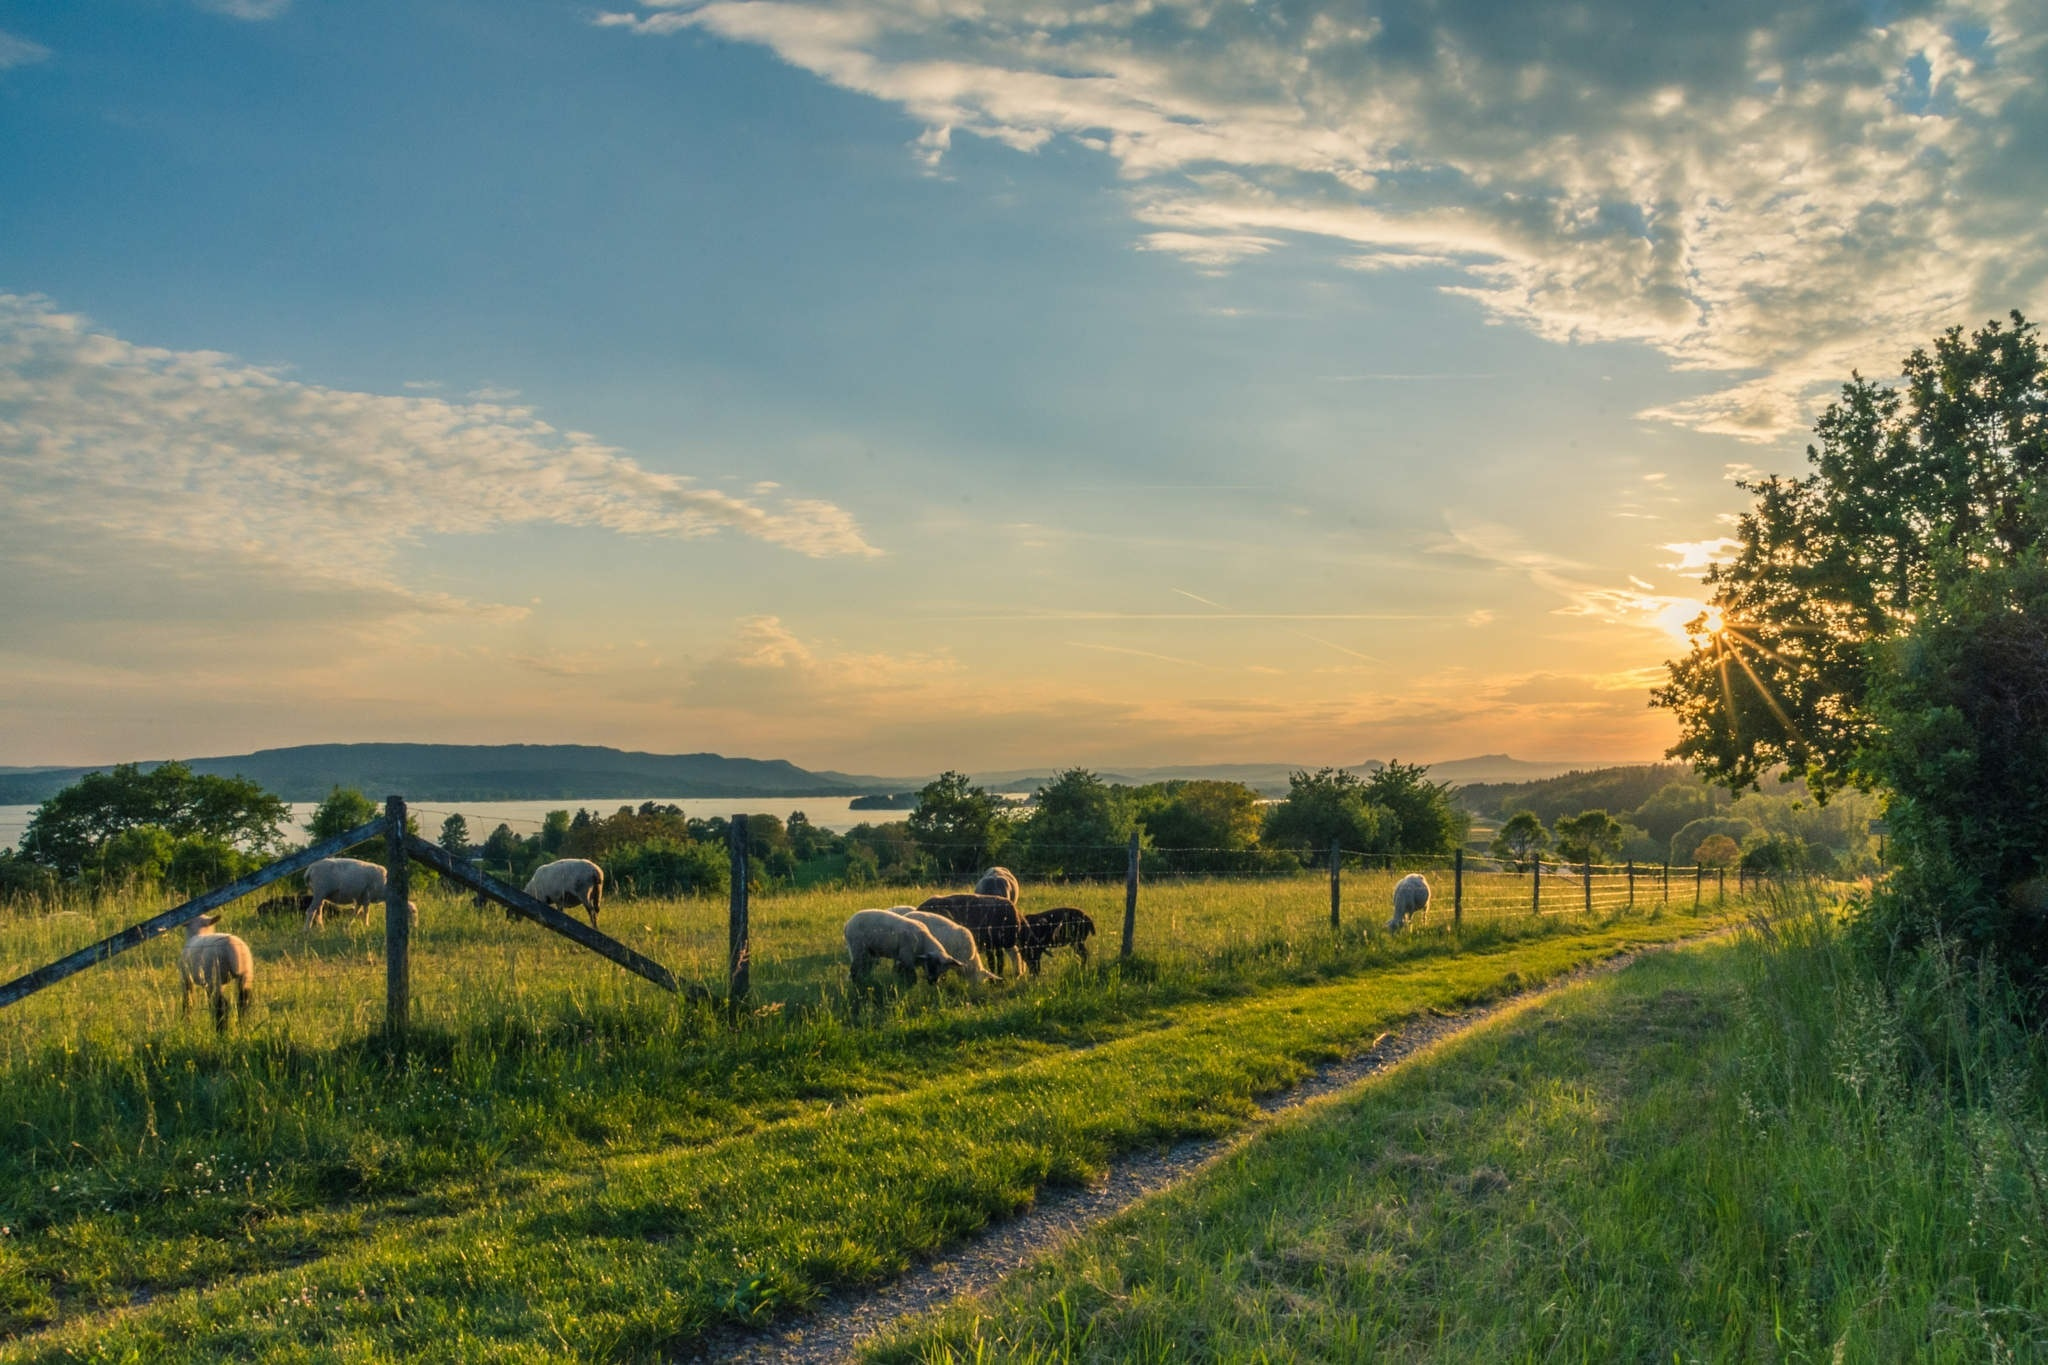 Securing your farm through livestock theft prevention